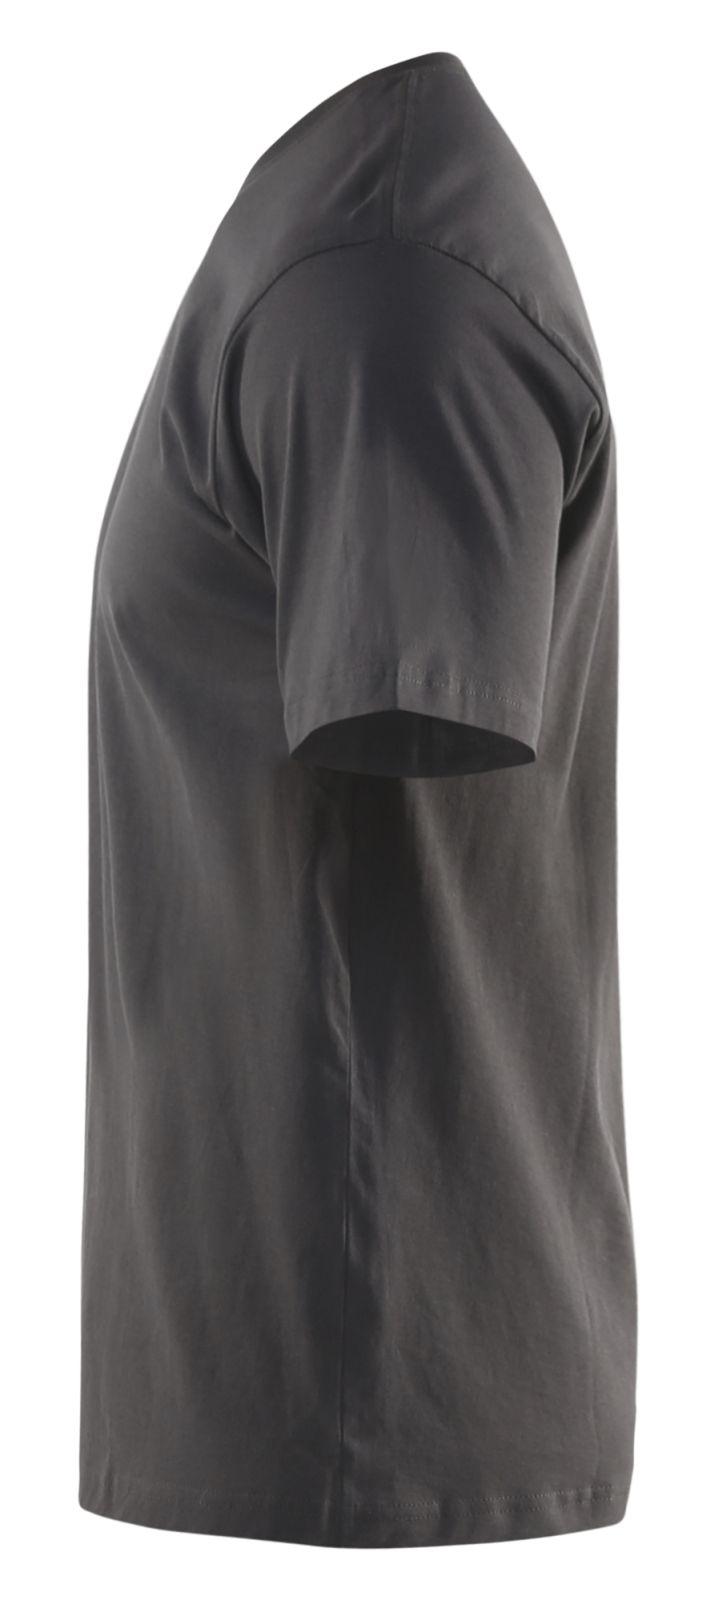 Blaklader T-shirts 35251042 donkergrijs(9800)